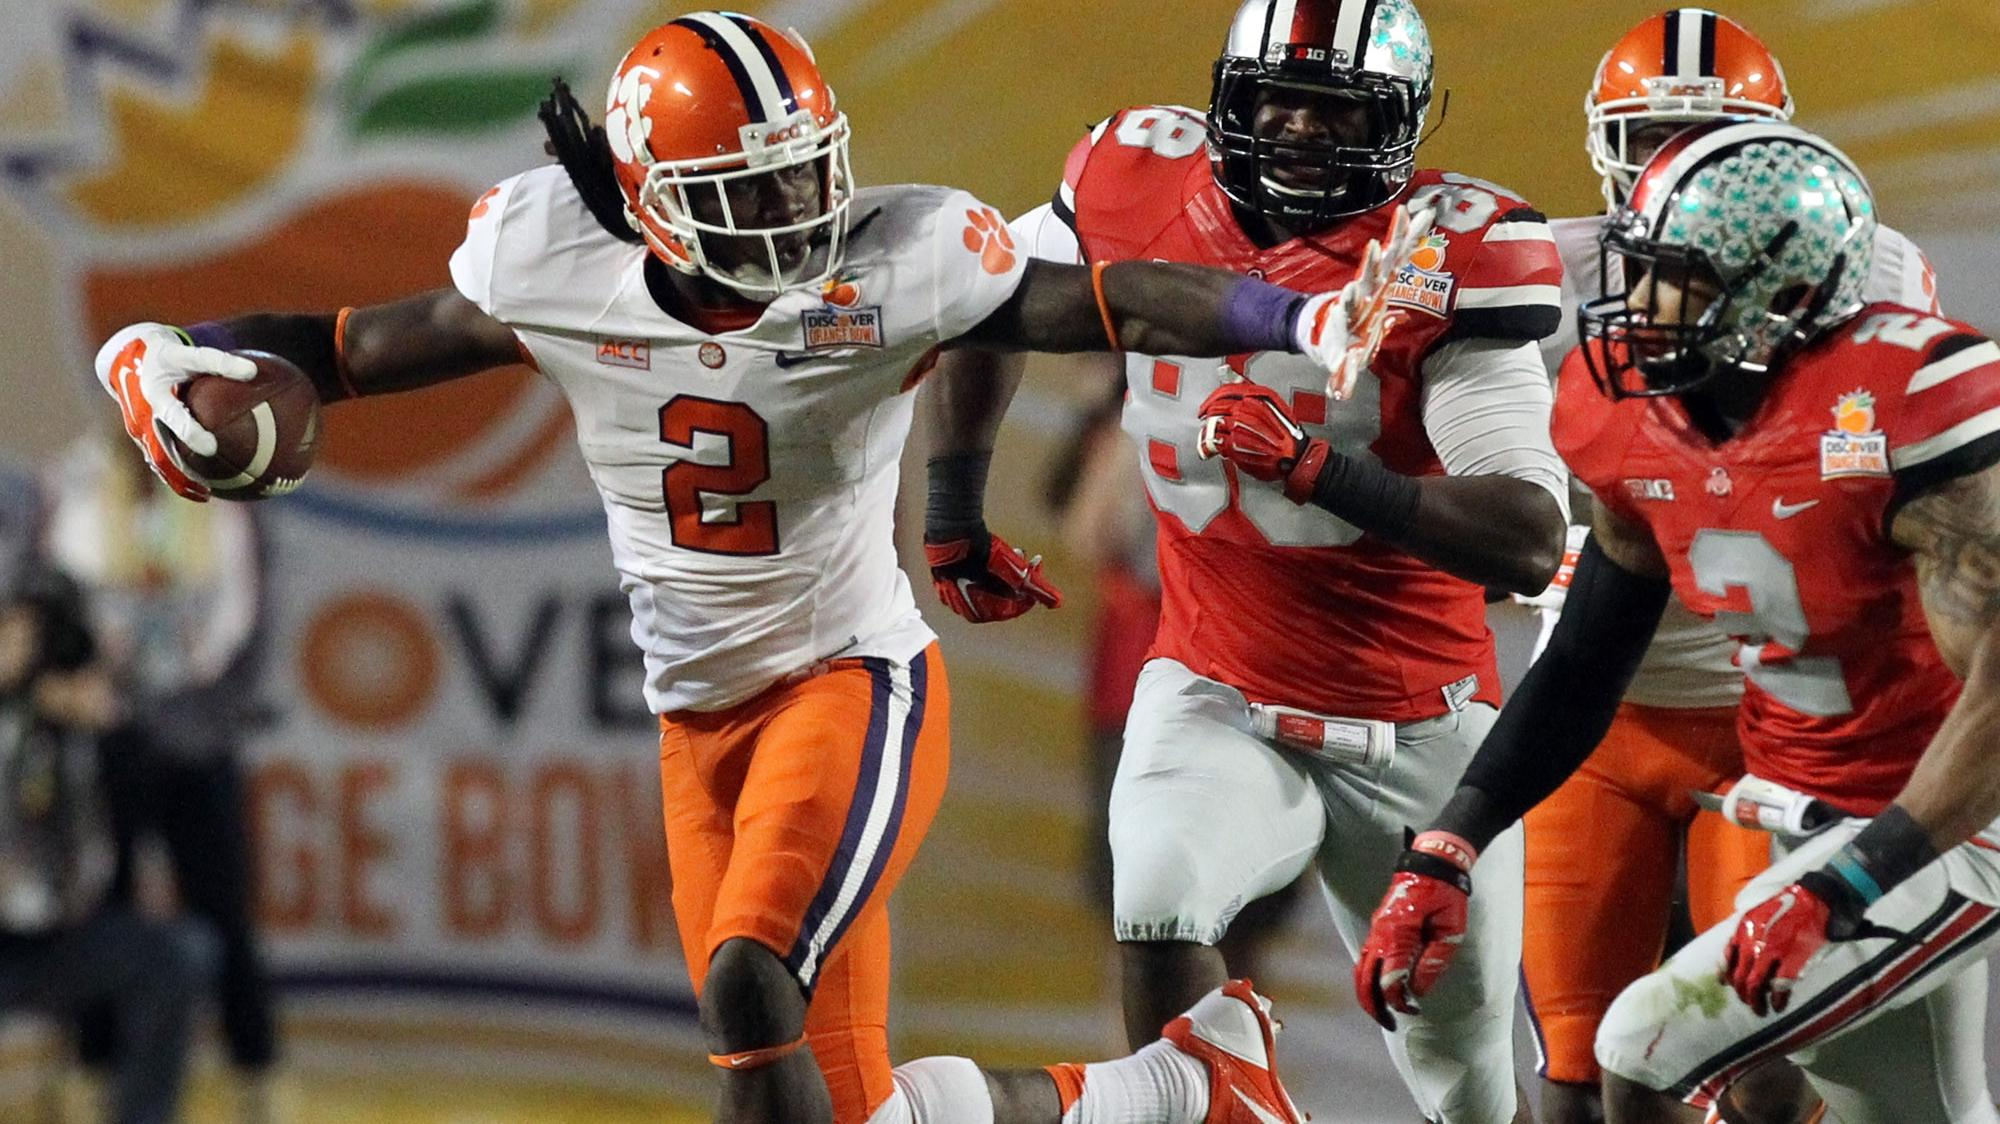 Watkins, Bryant, Breeland to Turn Professional